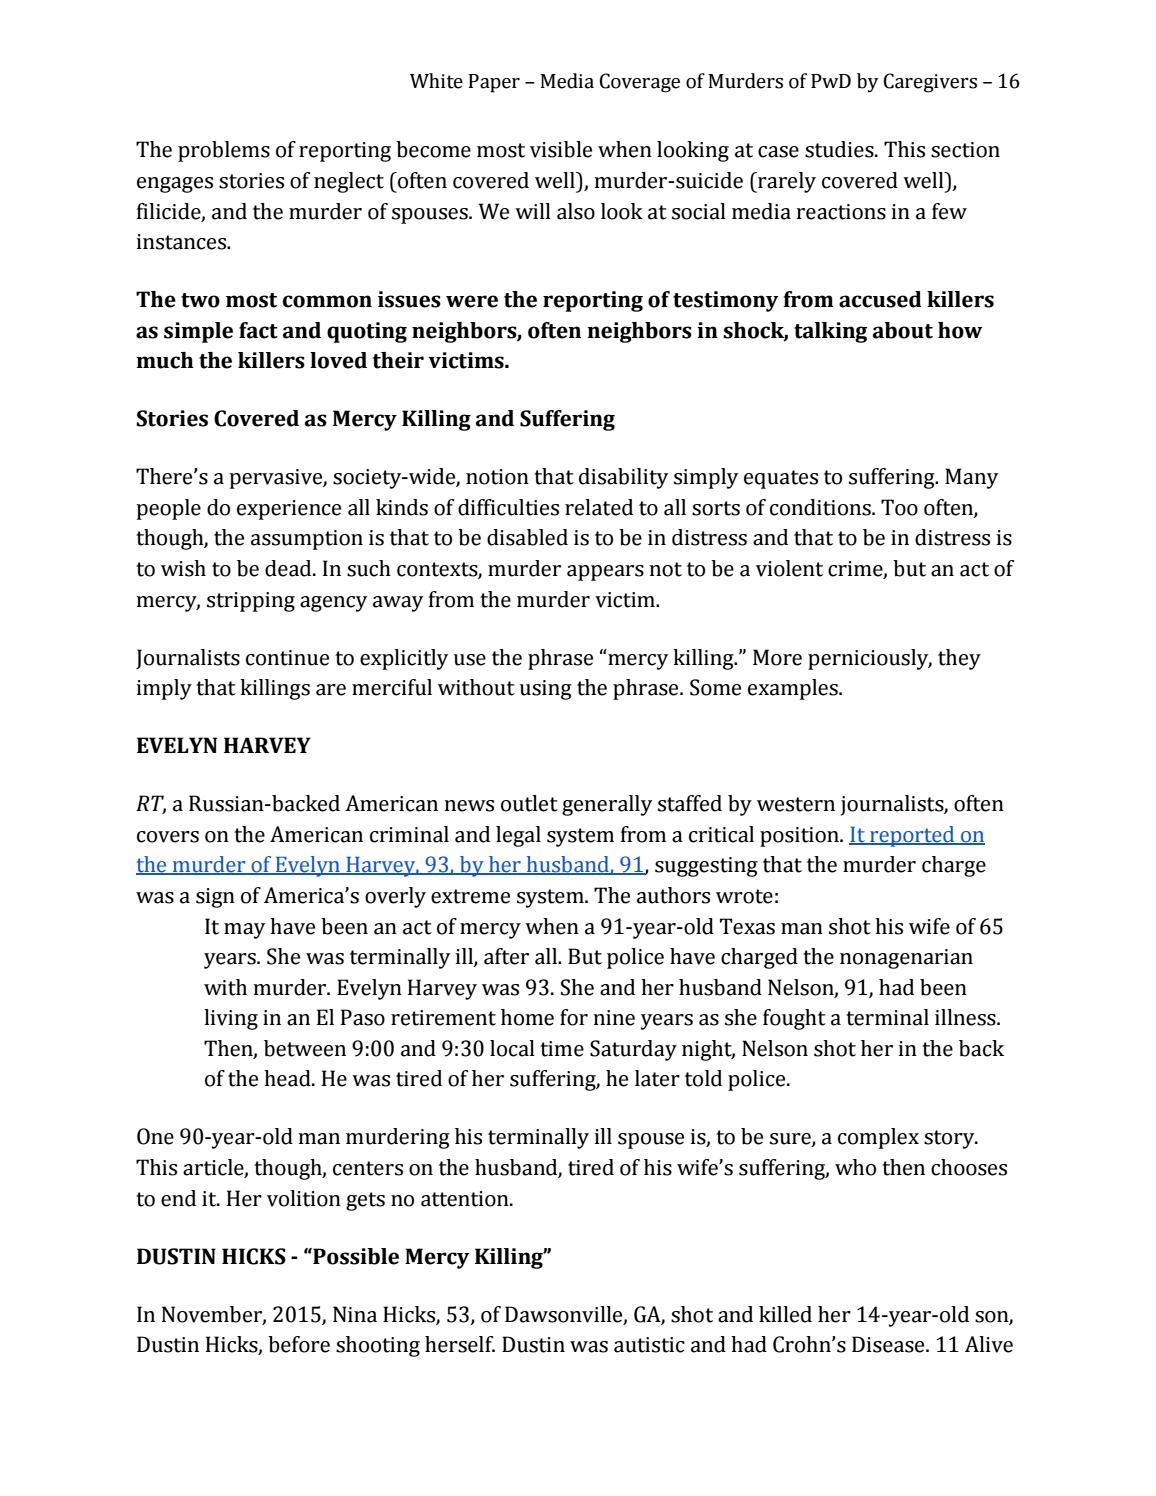 Reflection on Mercy Killing Essay - Words